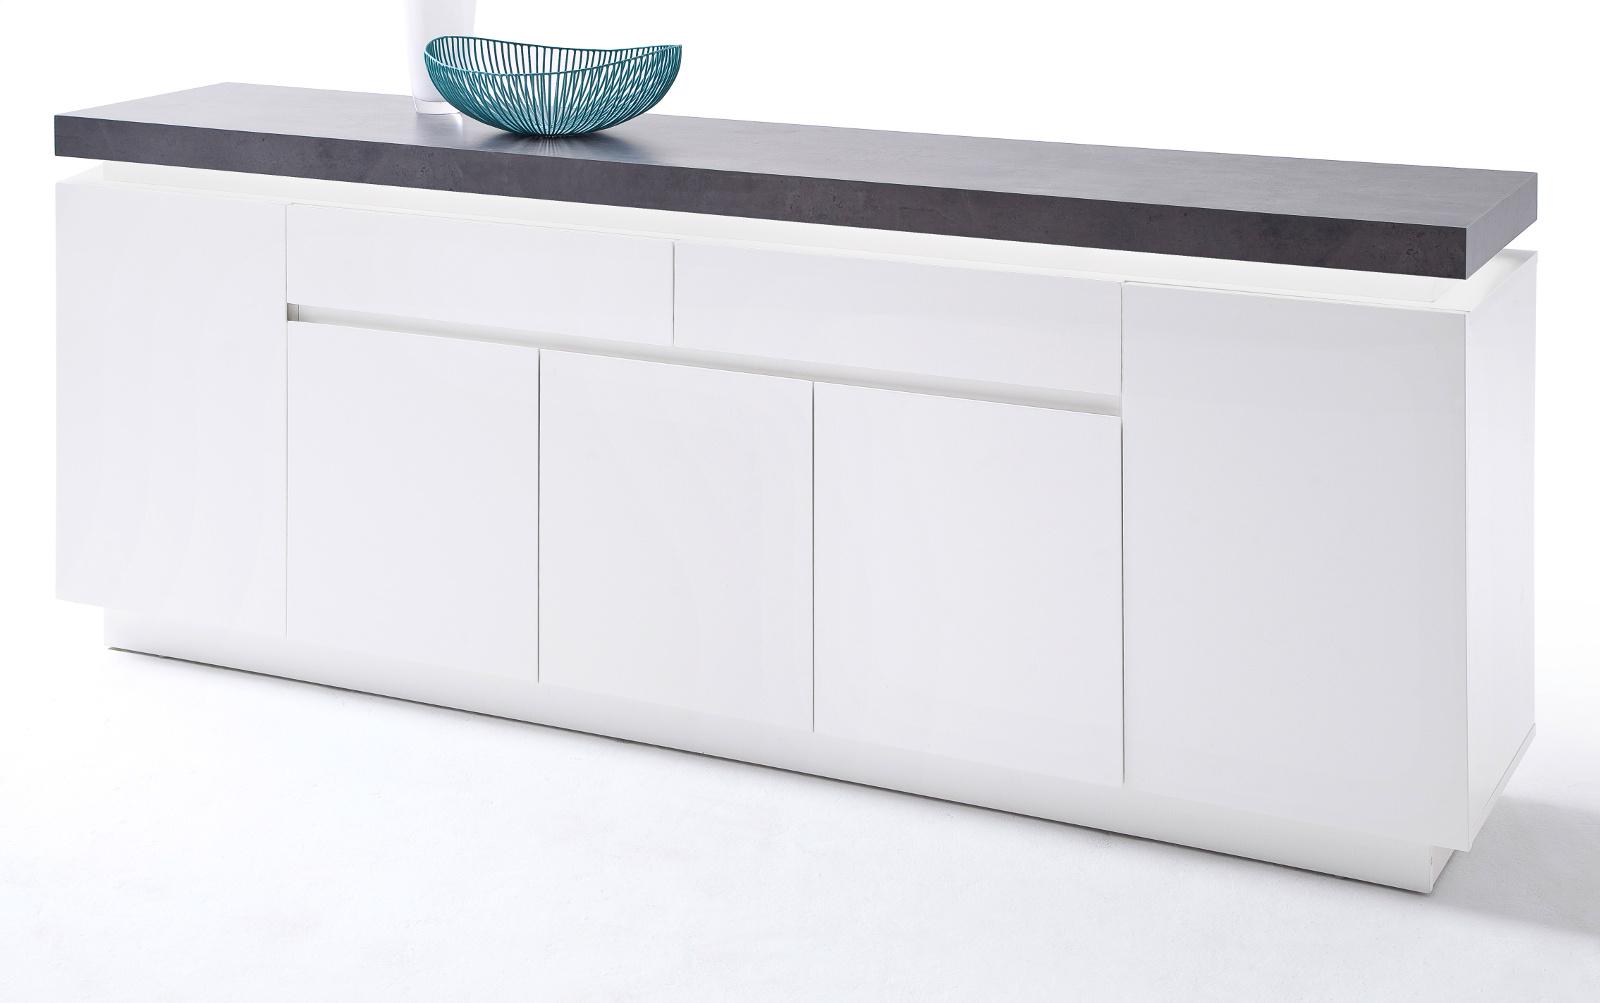 sideboard atlanta matt wei und stone design 200 cm. Black Bedroom Furniture Sets. Home Design Ideas